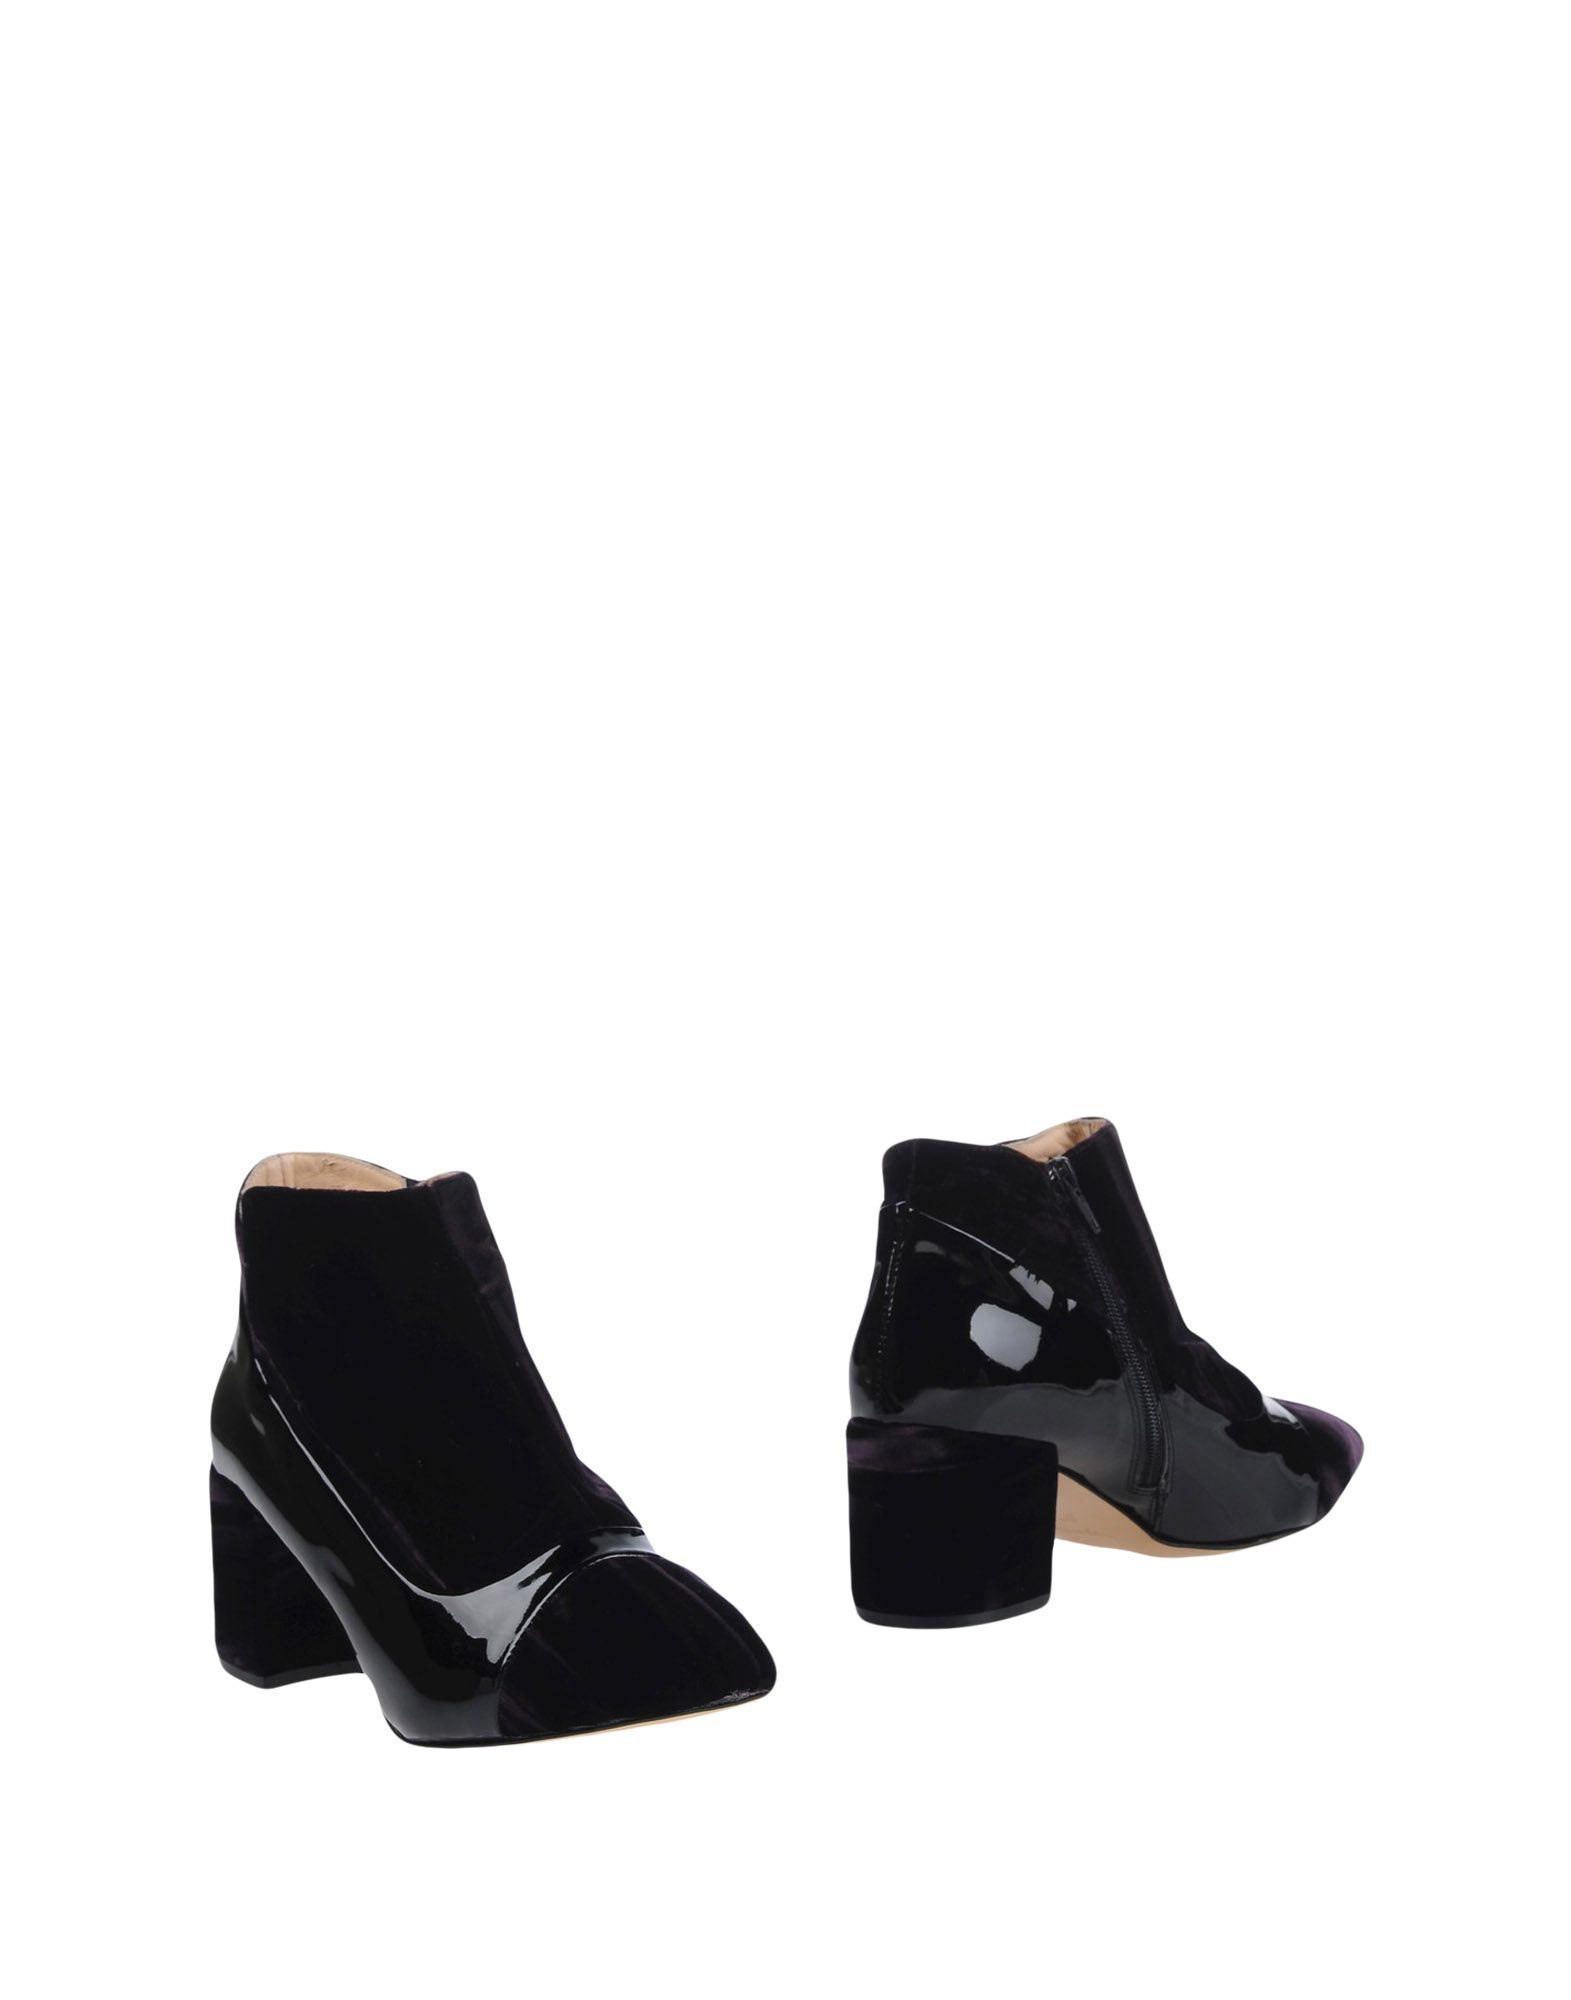 1725.A Stiefelette Damen Qualität  11223789XL Gute Qualität Damen beliebte Schuhe cf2b5b